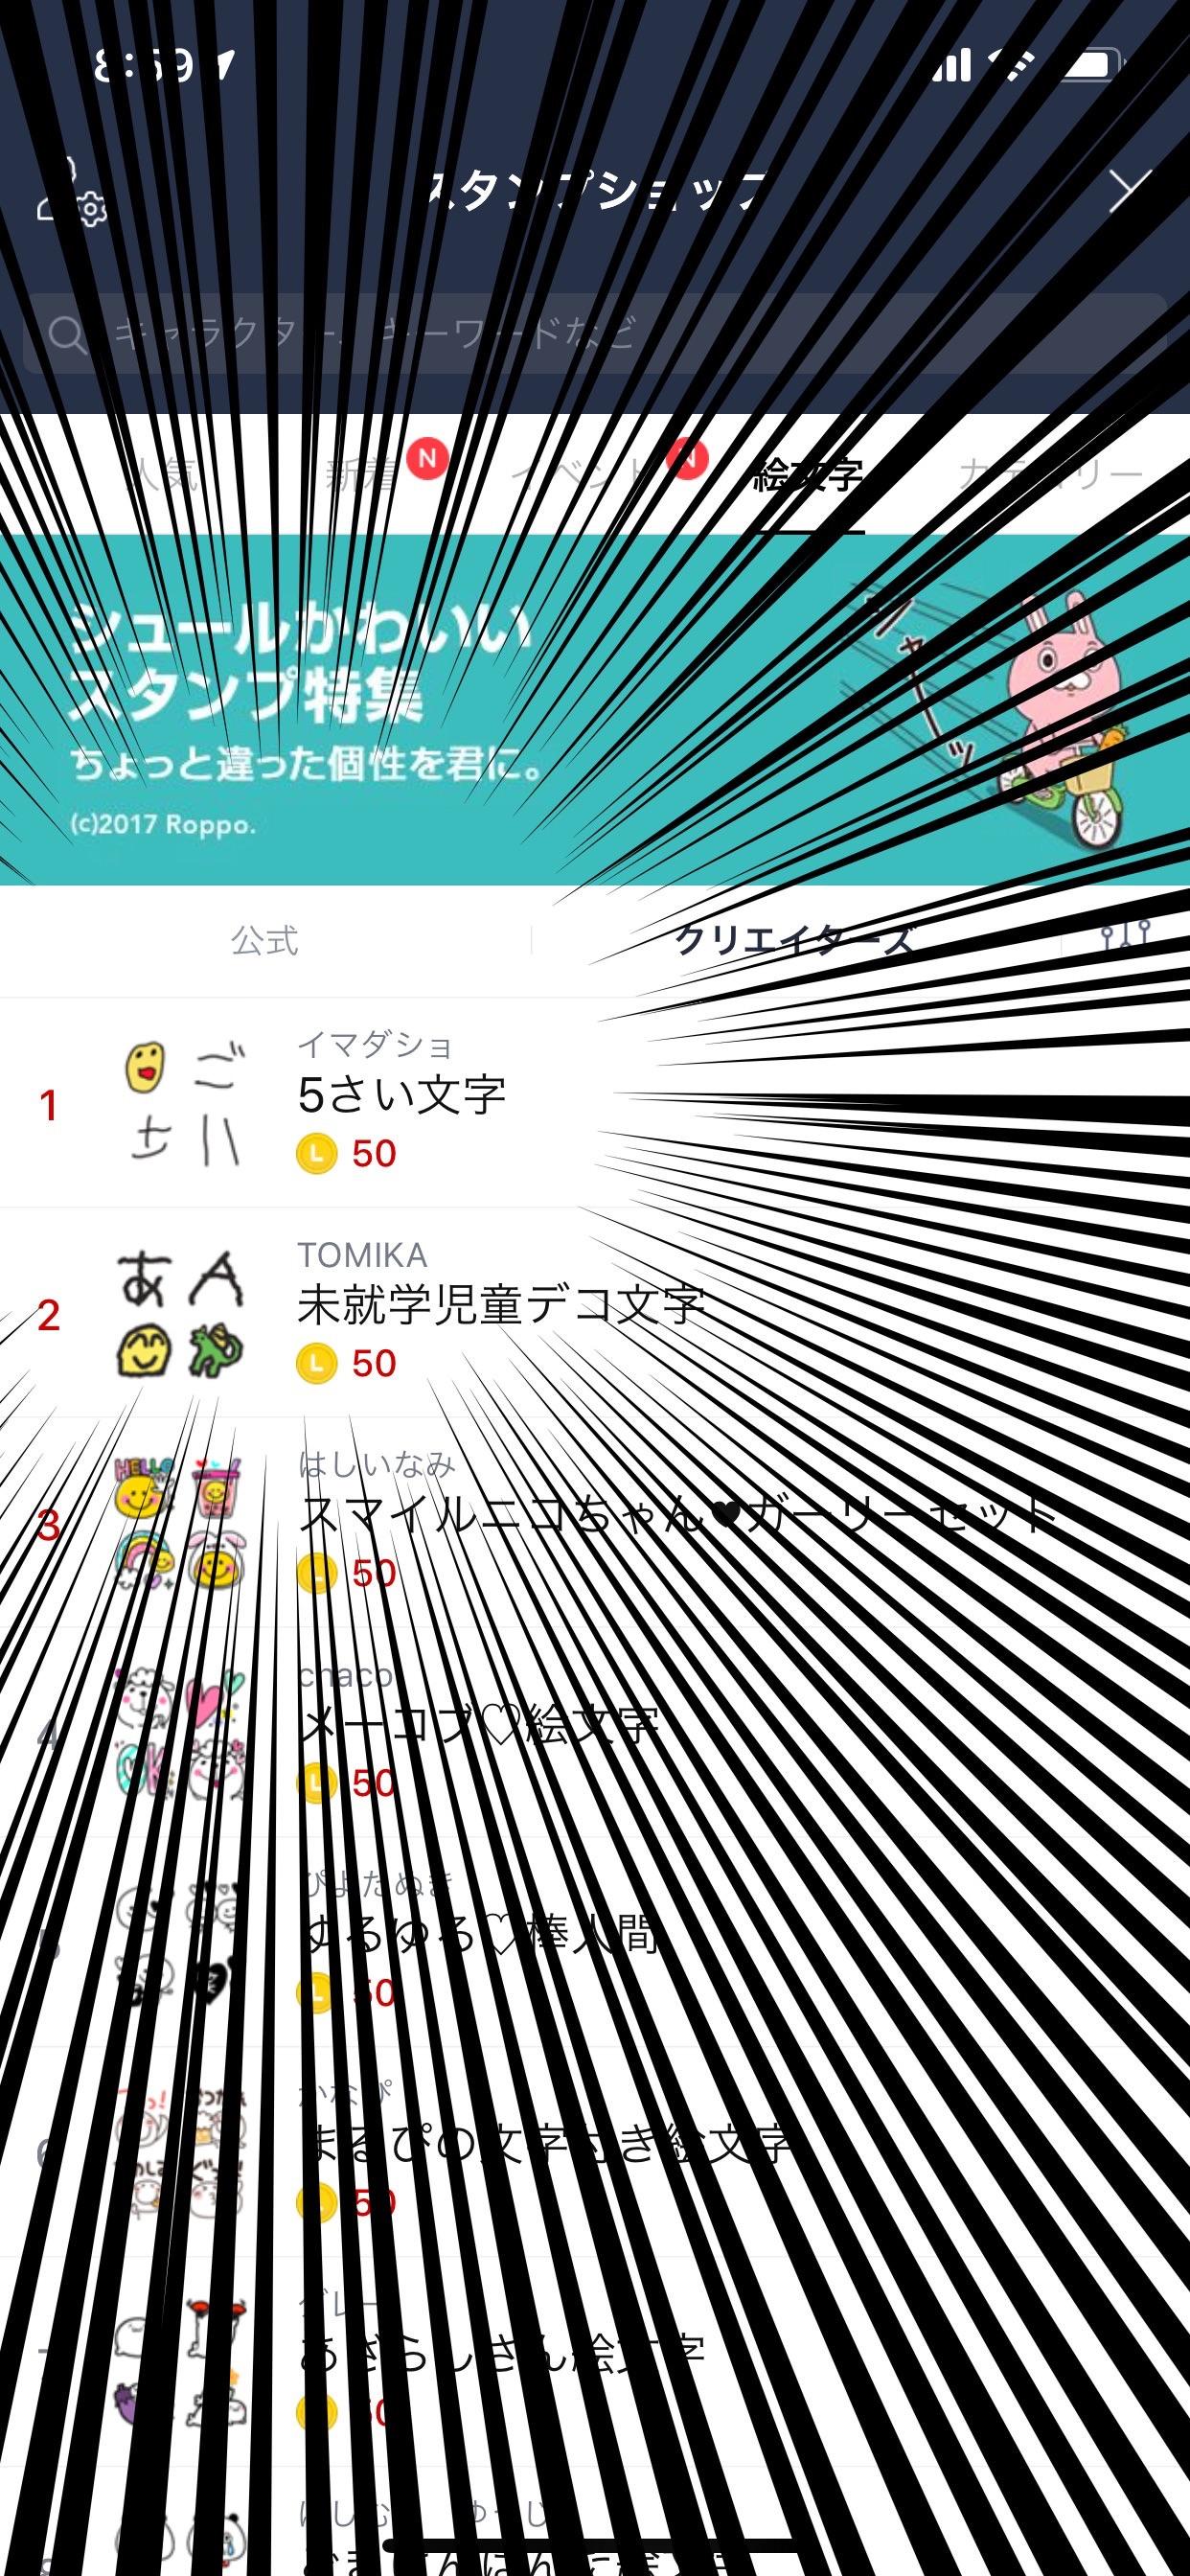 gosai-stamp-3